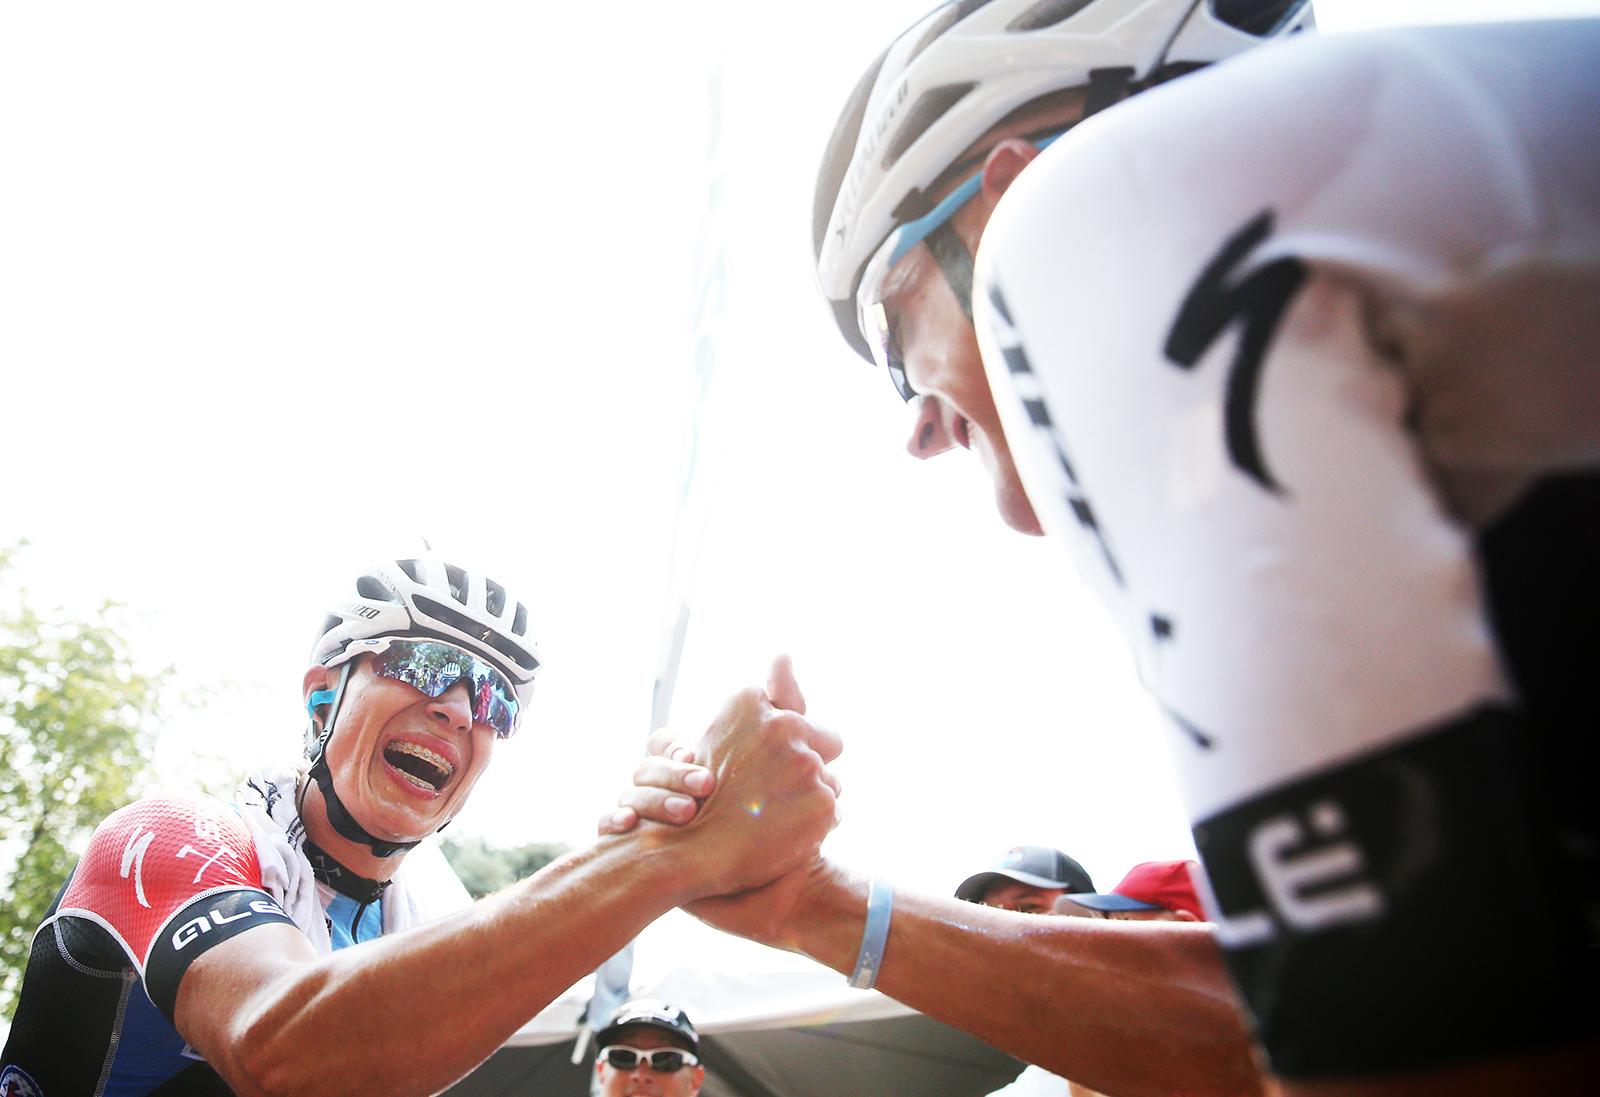 Jasper Philipsen (Hagens Berman Axeon) celebrates the win with his teammate. 2018 Tour of Utah Stage 4, August 8, 2018, Salt Lake City, Utah. Photo by Cathy Fegan-Kim, cottonsoxphotography.net